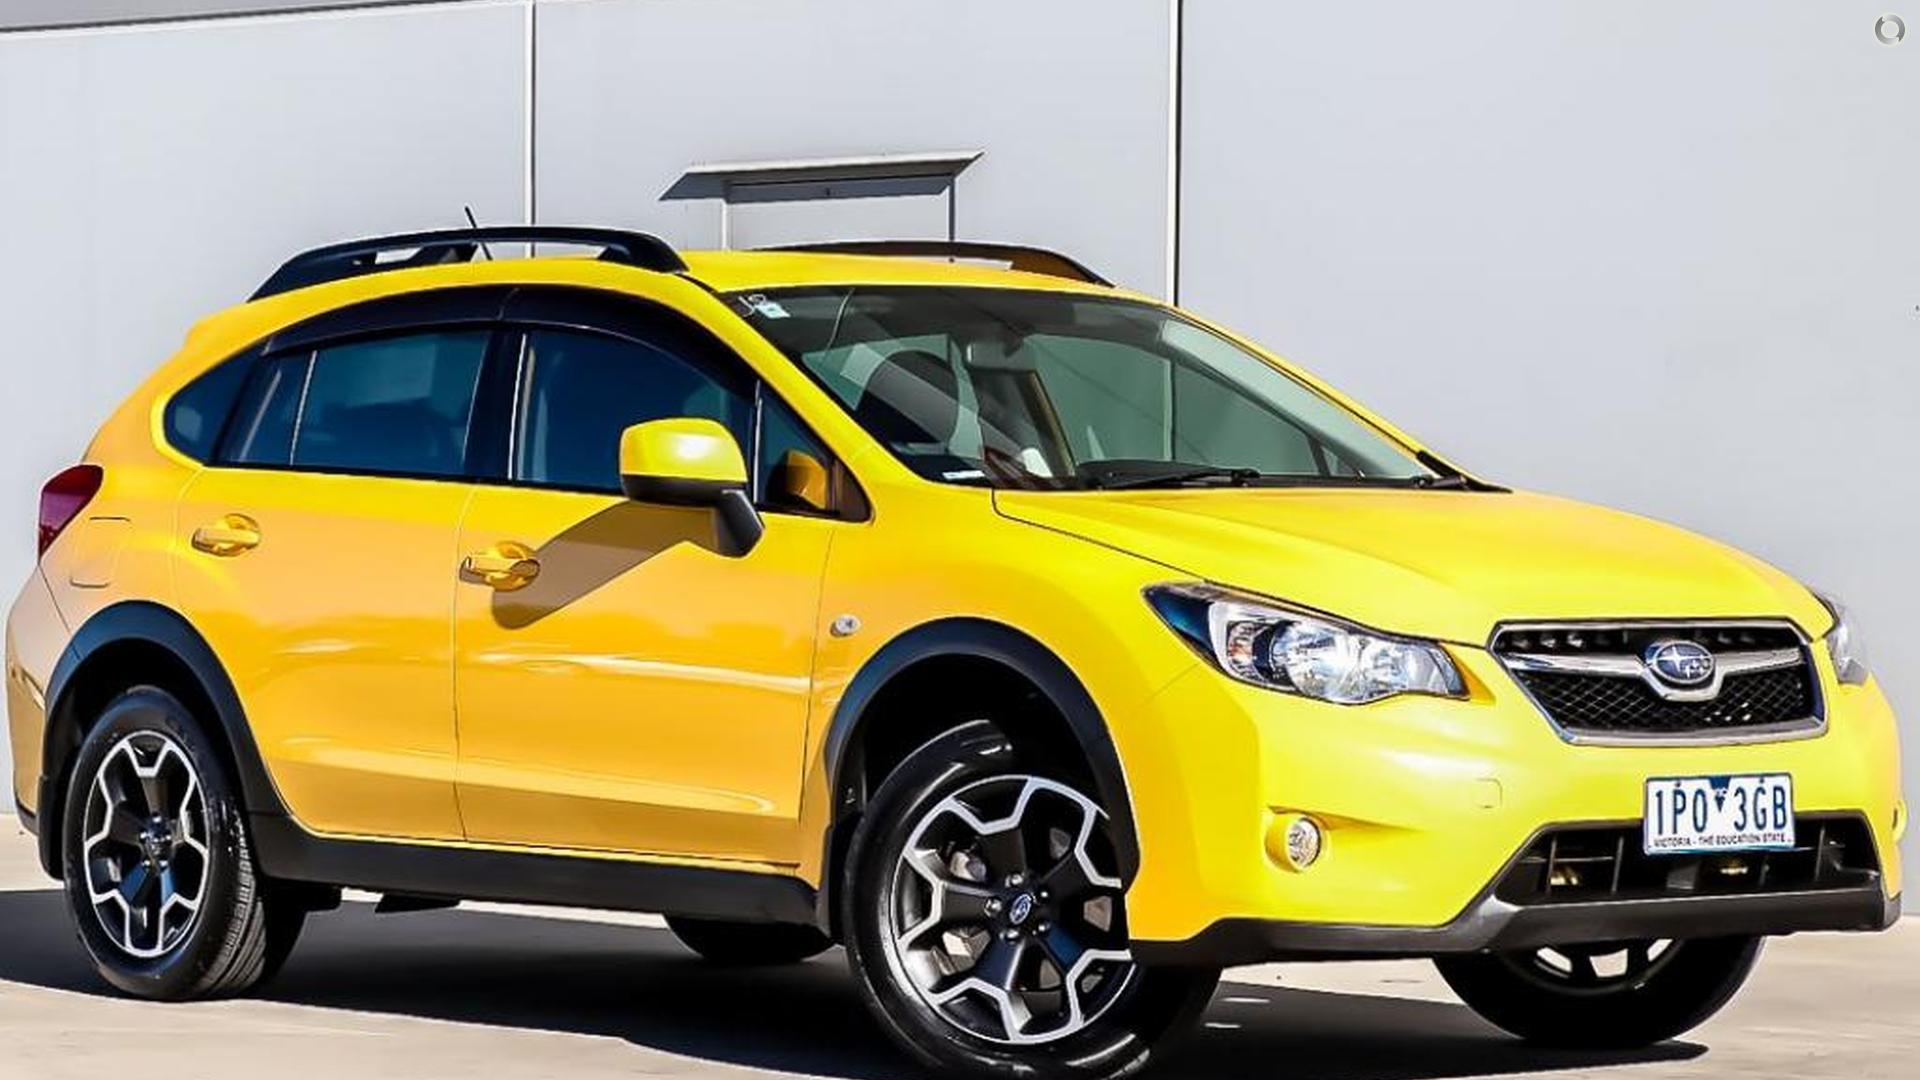 2015 Subaru Xv 2.0i Special Edition G4X